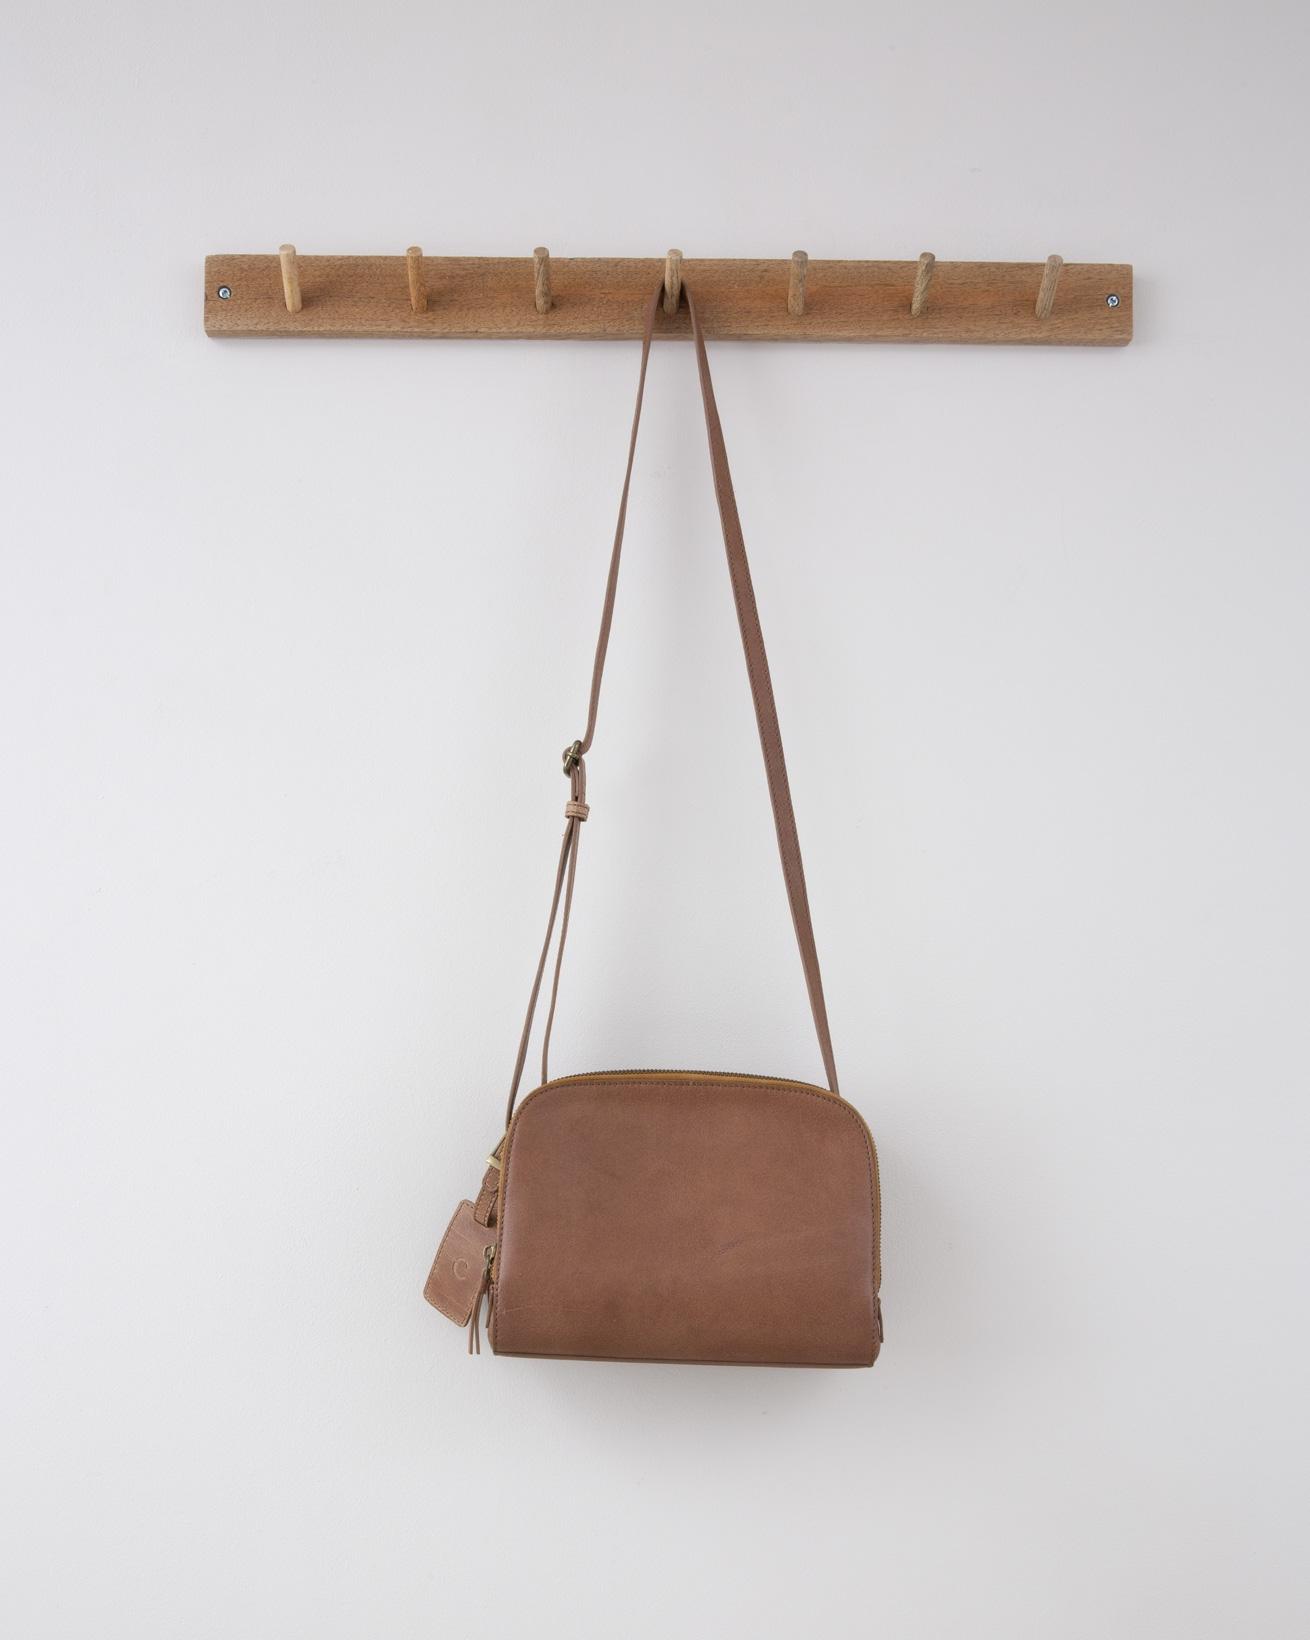 Double Zip Cross Body Bag - 23cm x 18cm - Nut - 1294